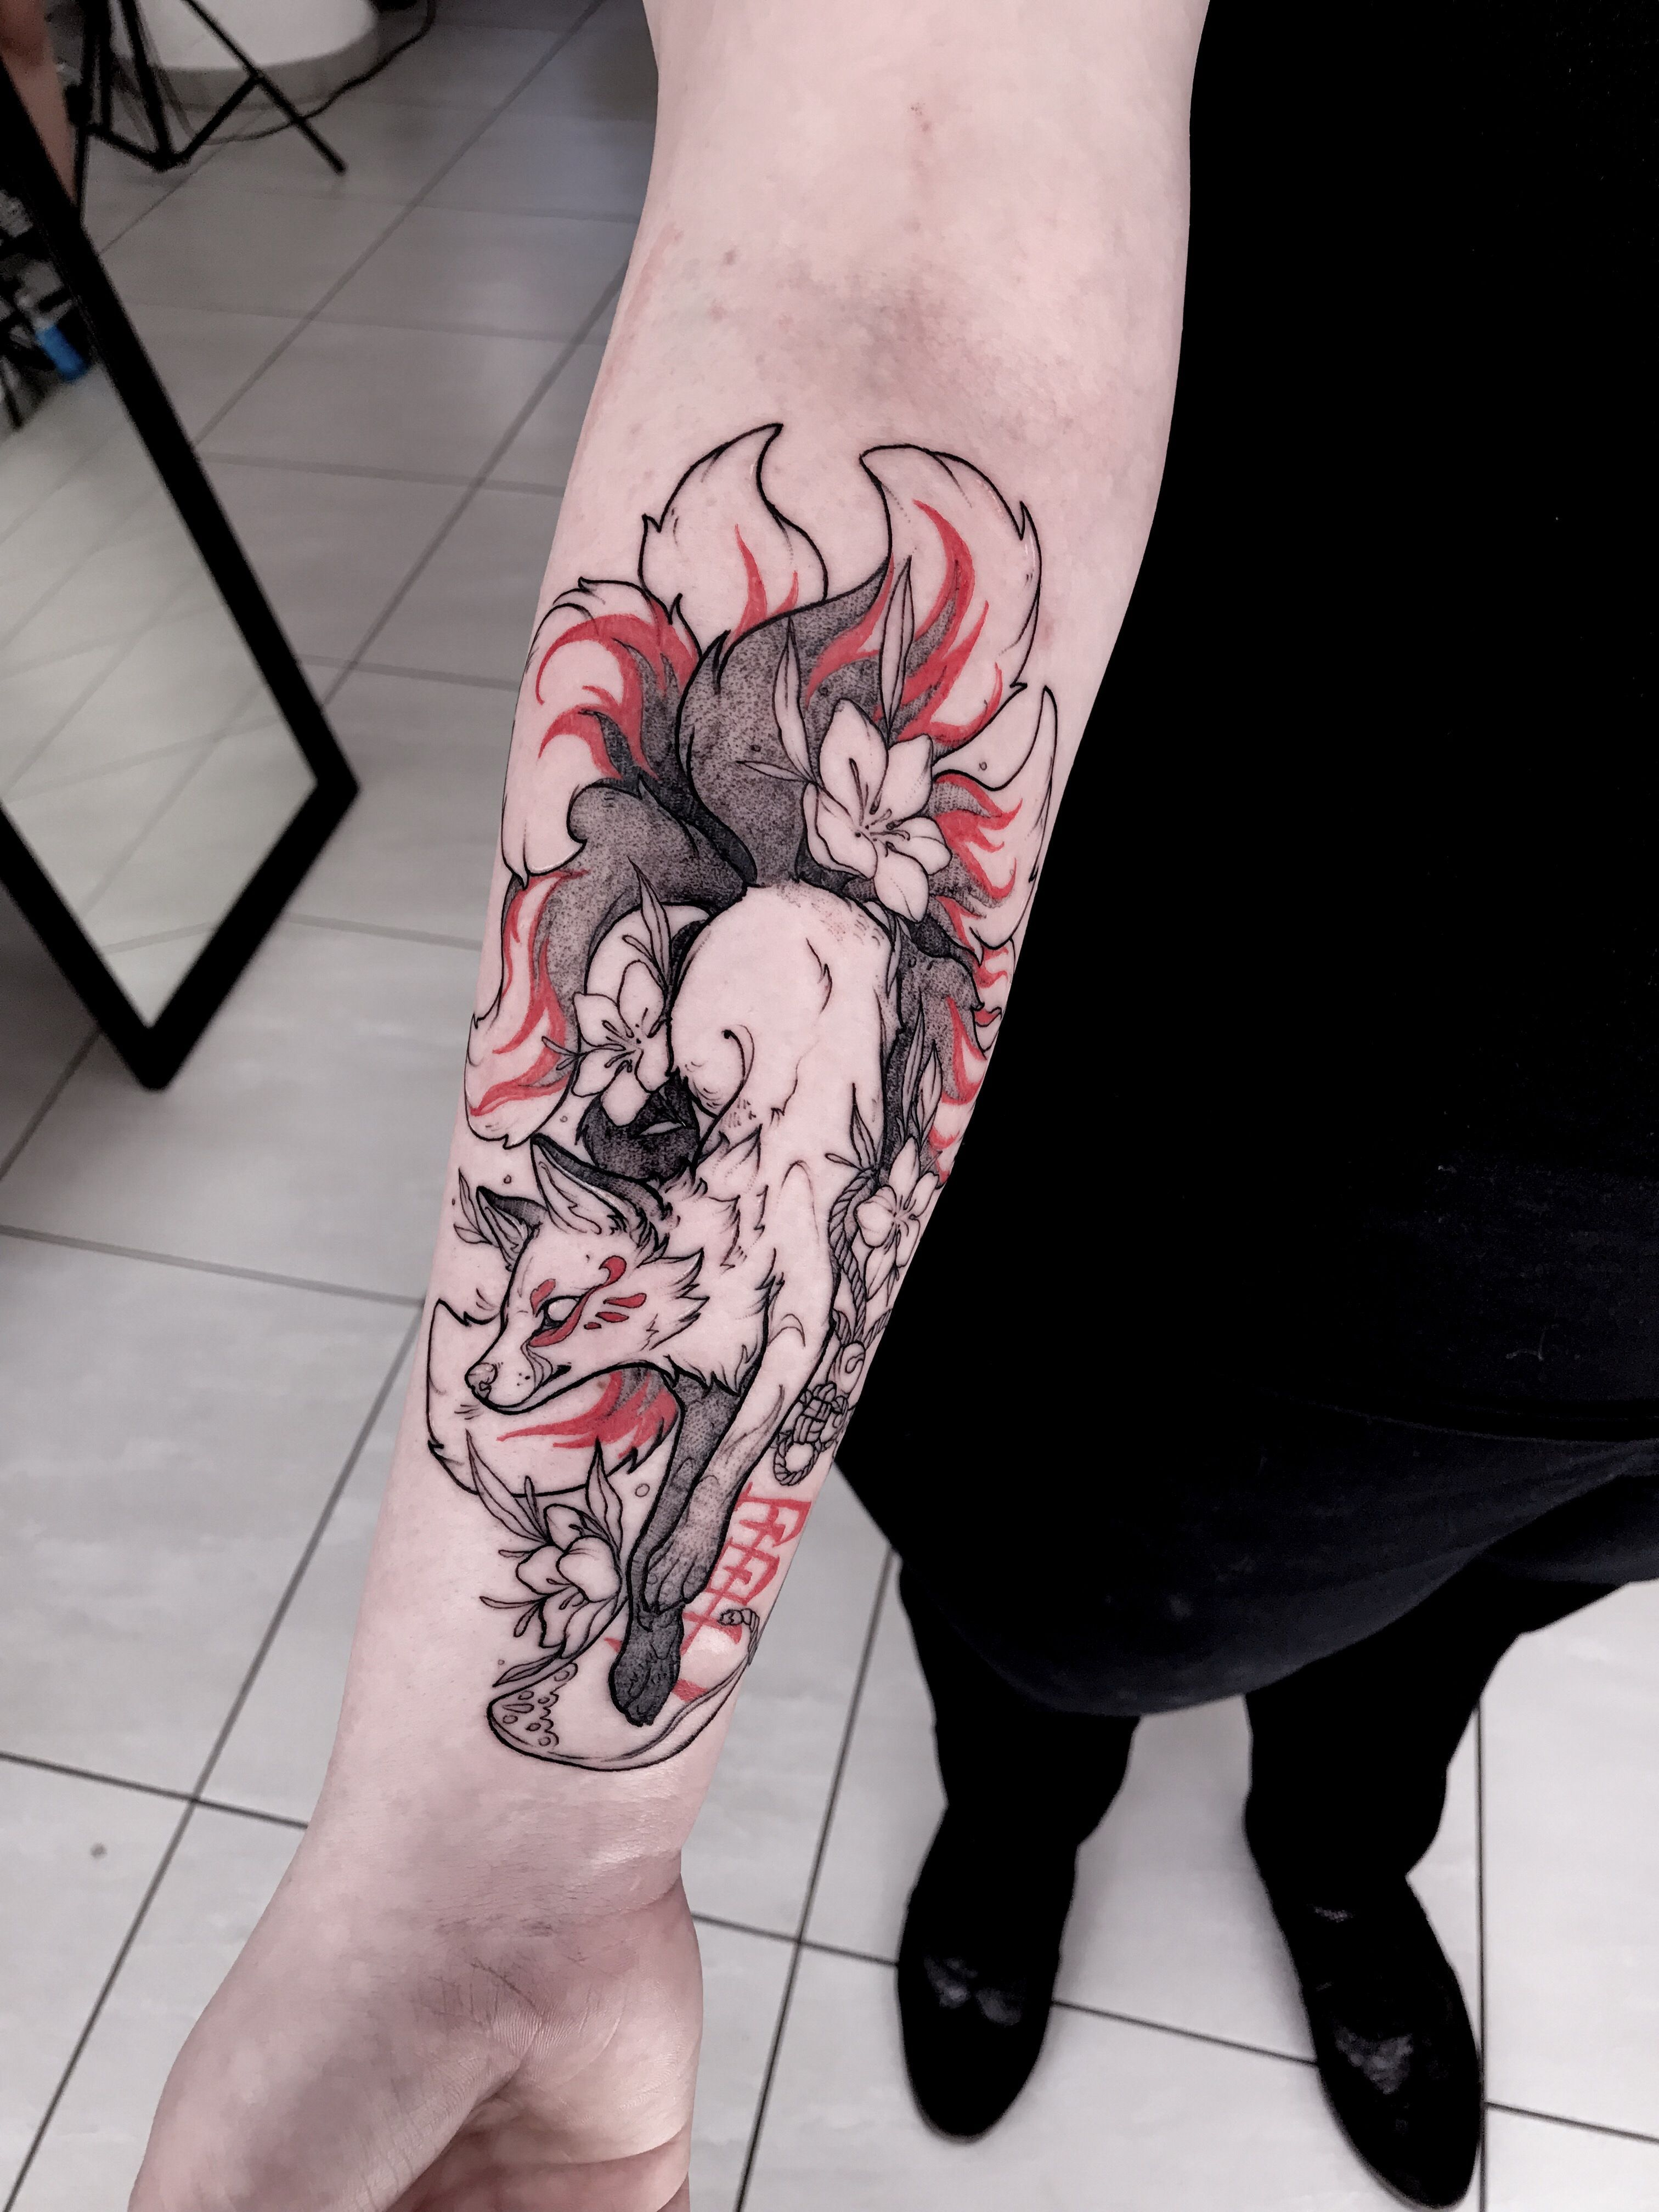 Pin By Madness Evi On Tattoos In 2020 Tattoos Body Art Tattoos Tattoo Designs